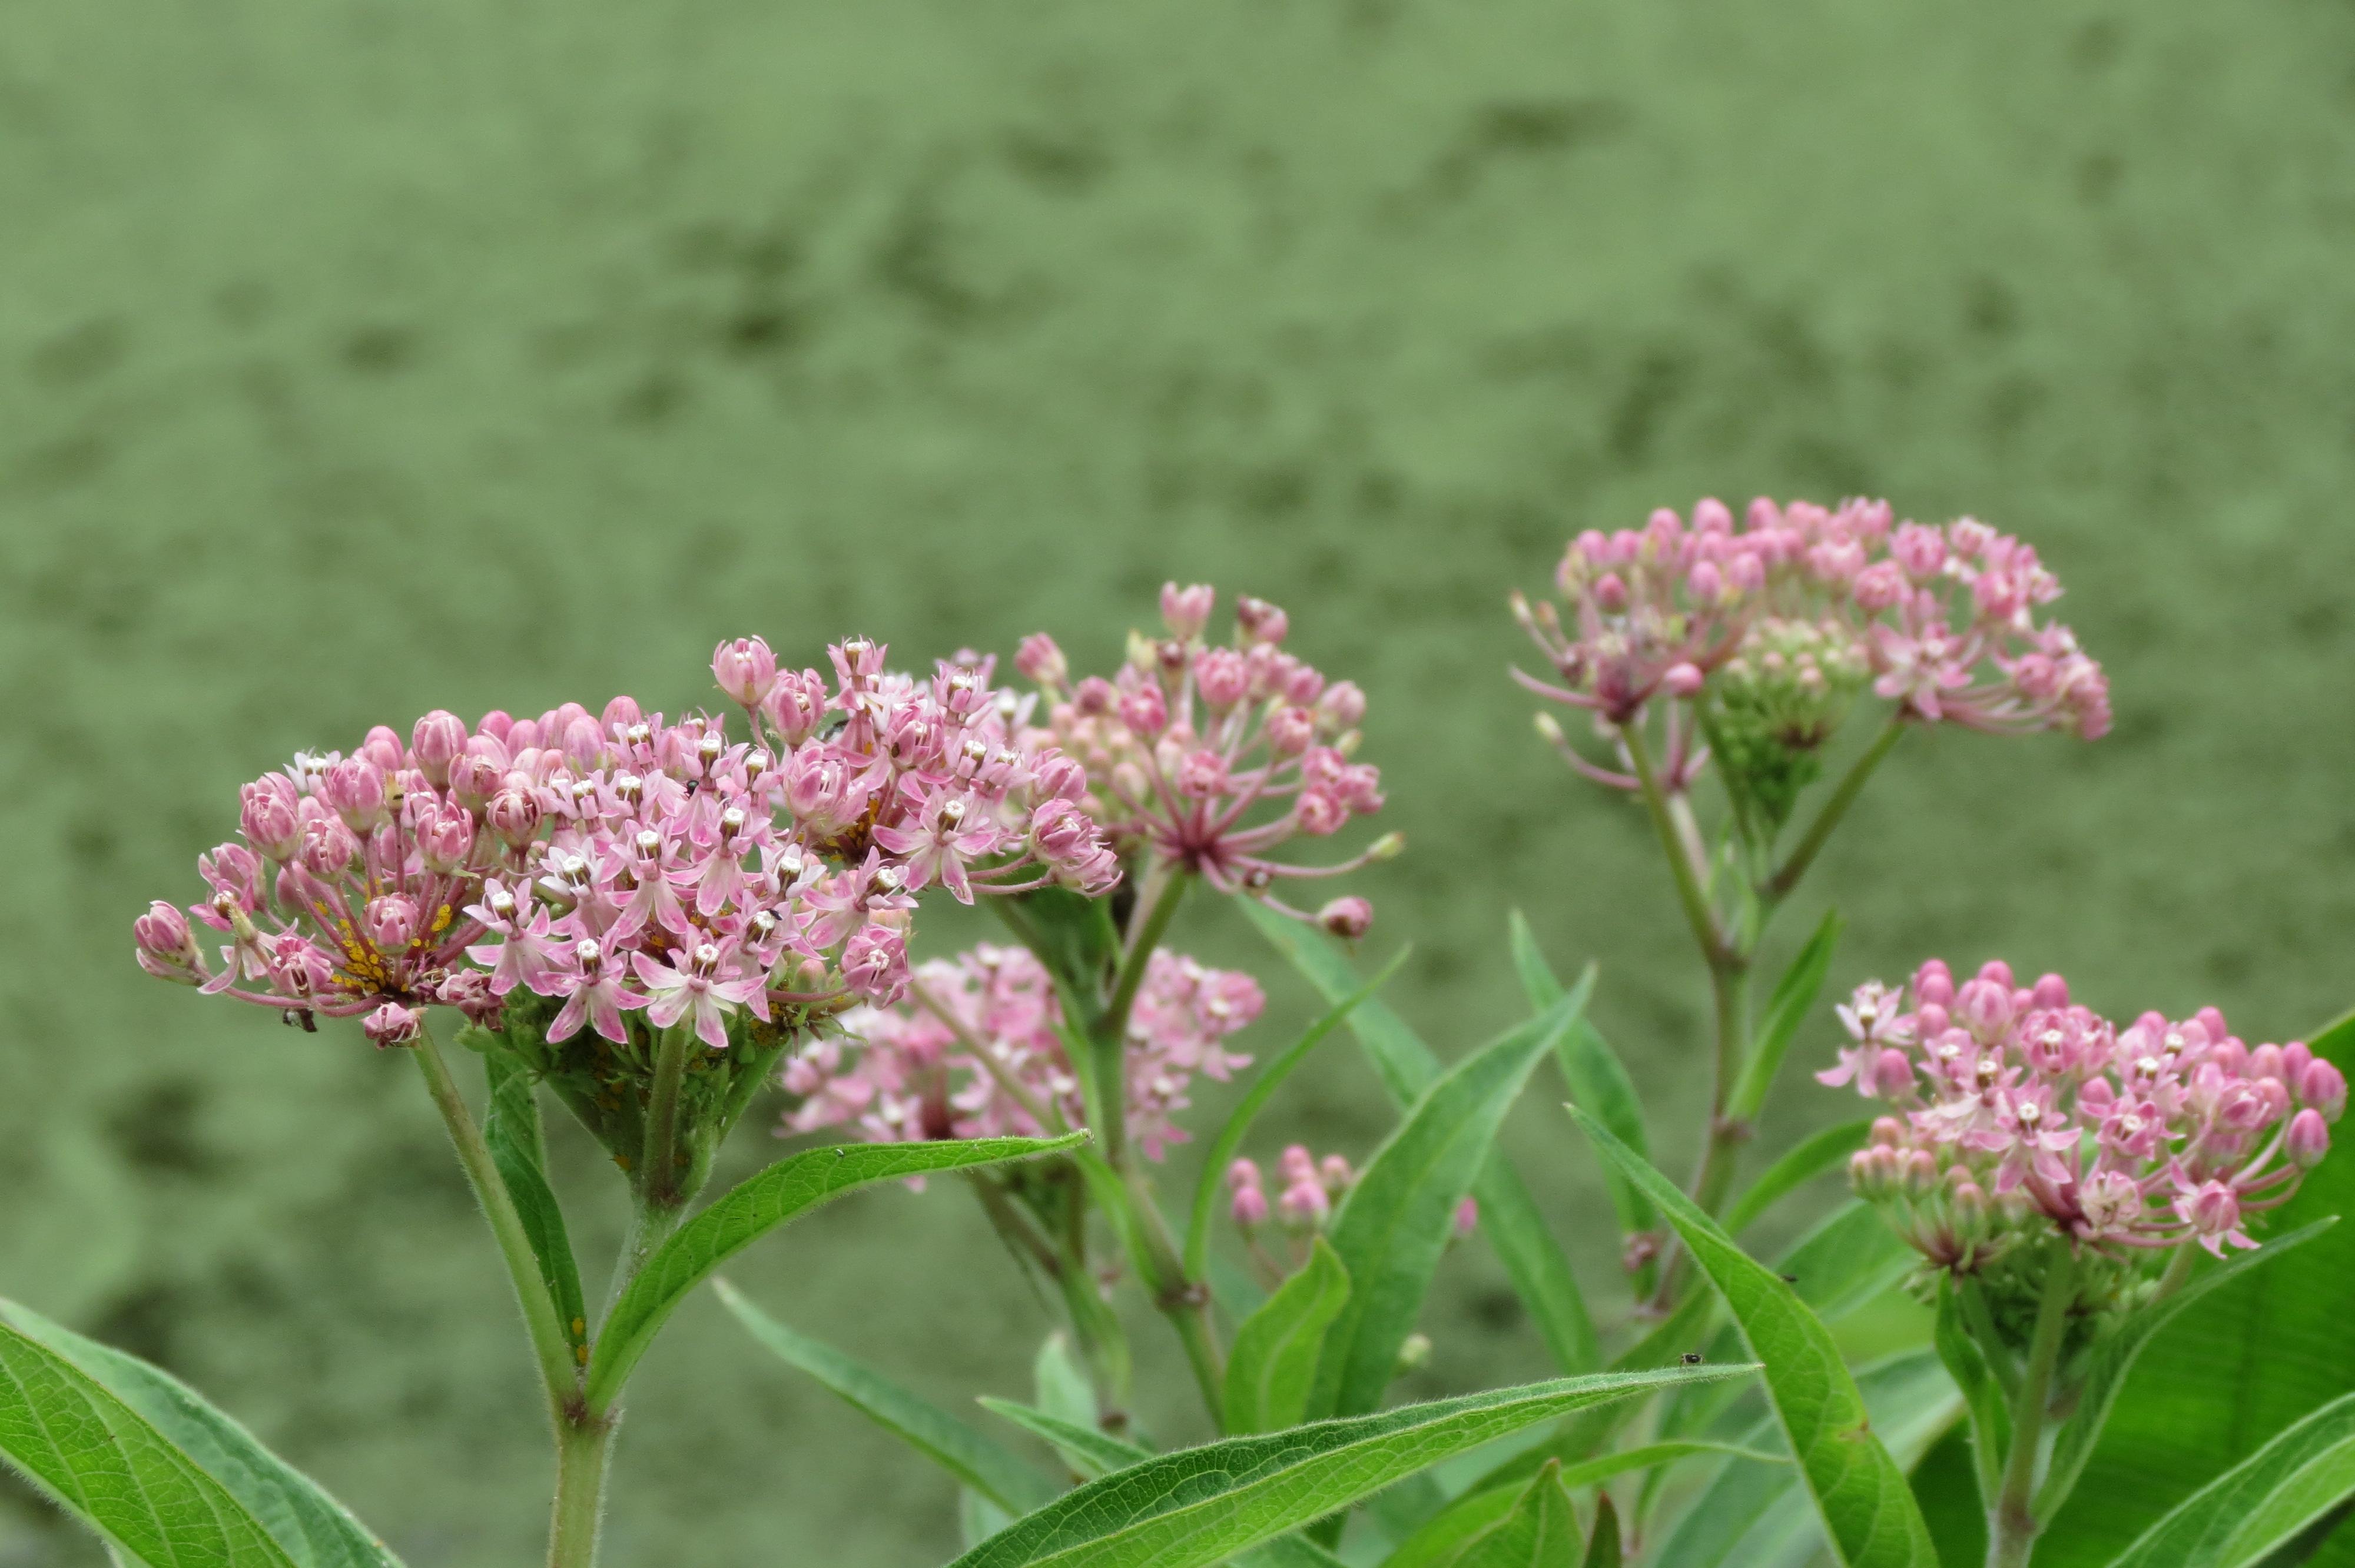 File:Swamp Milkweed (29098623233).jpg - Wikimedia Commons